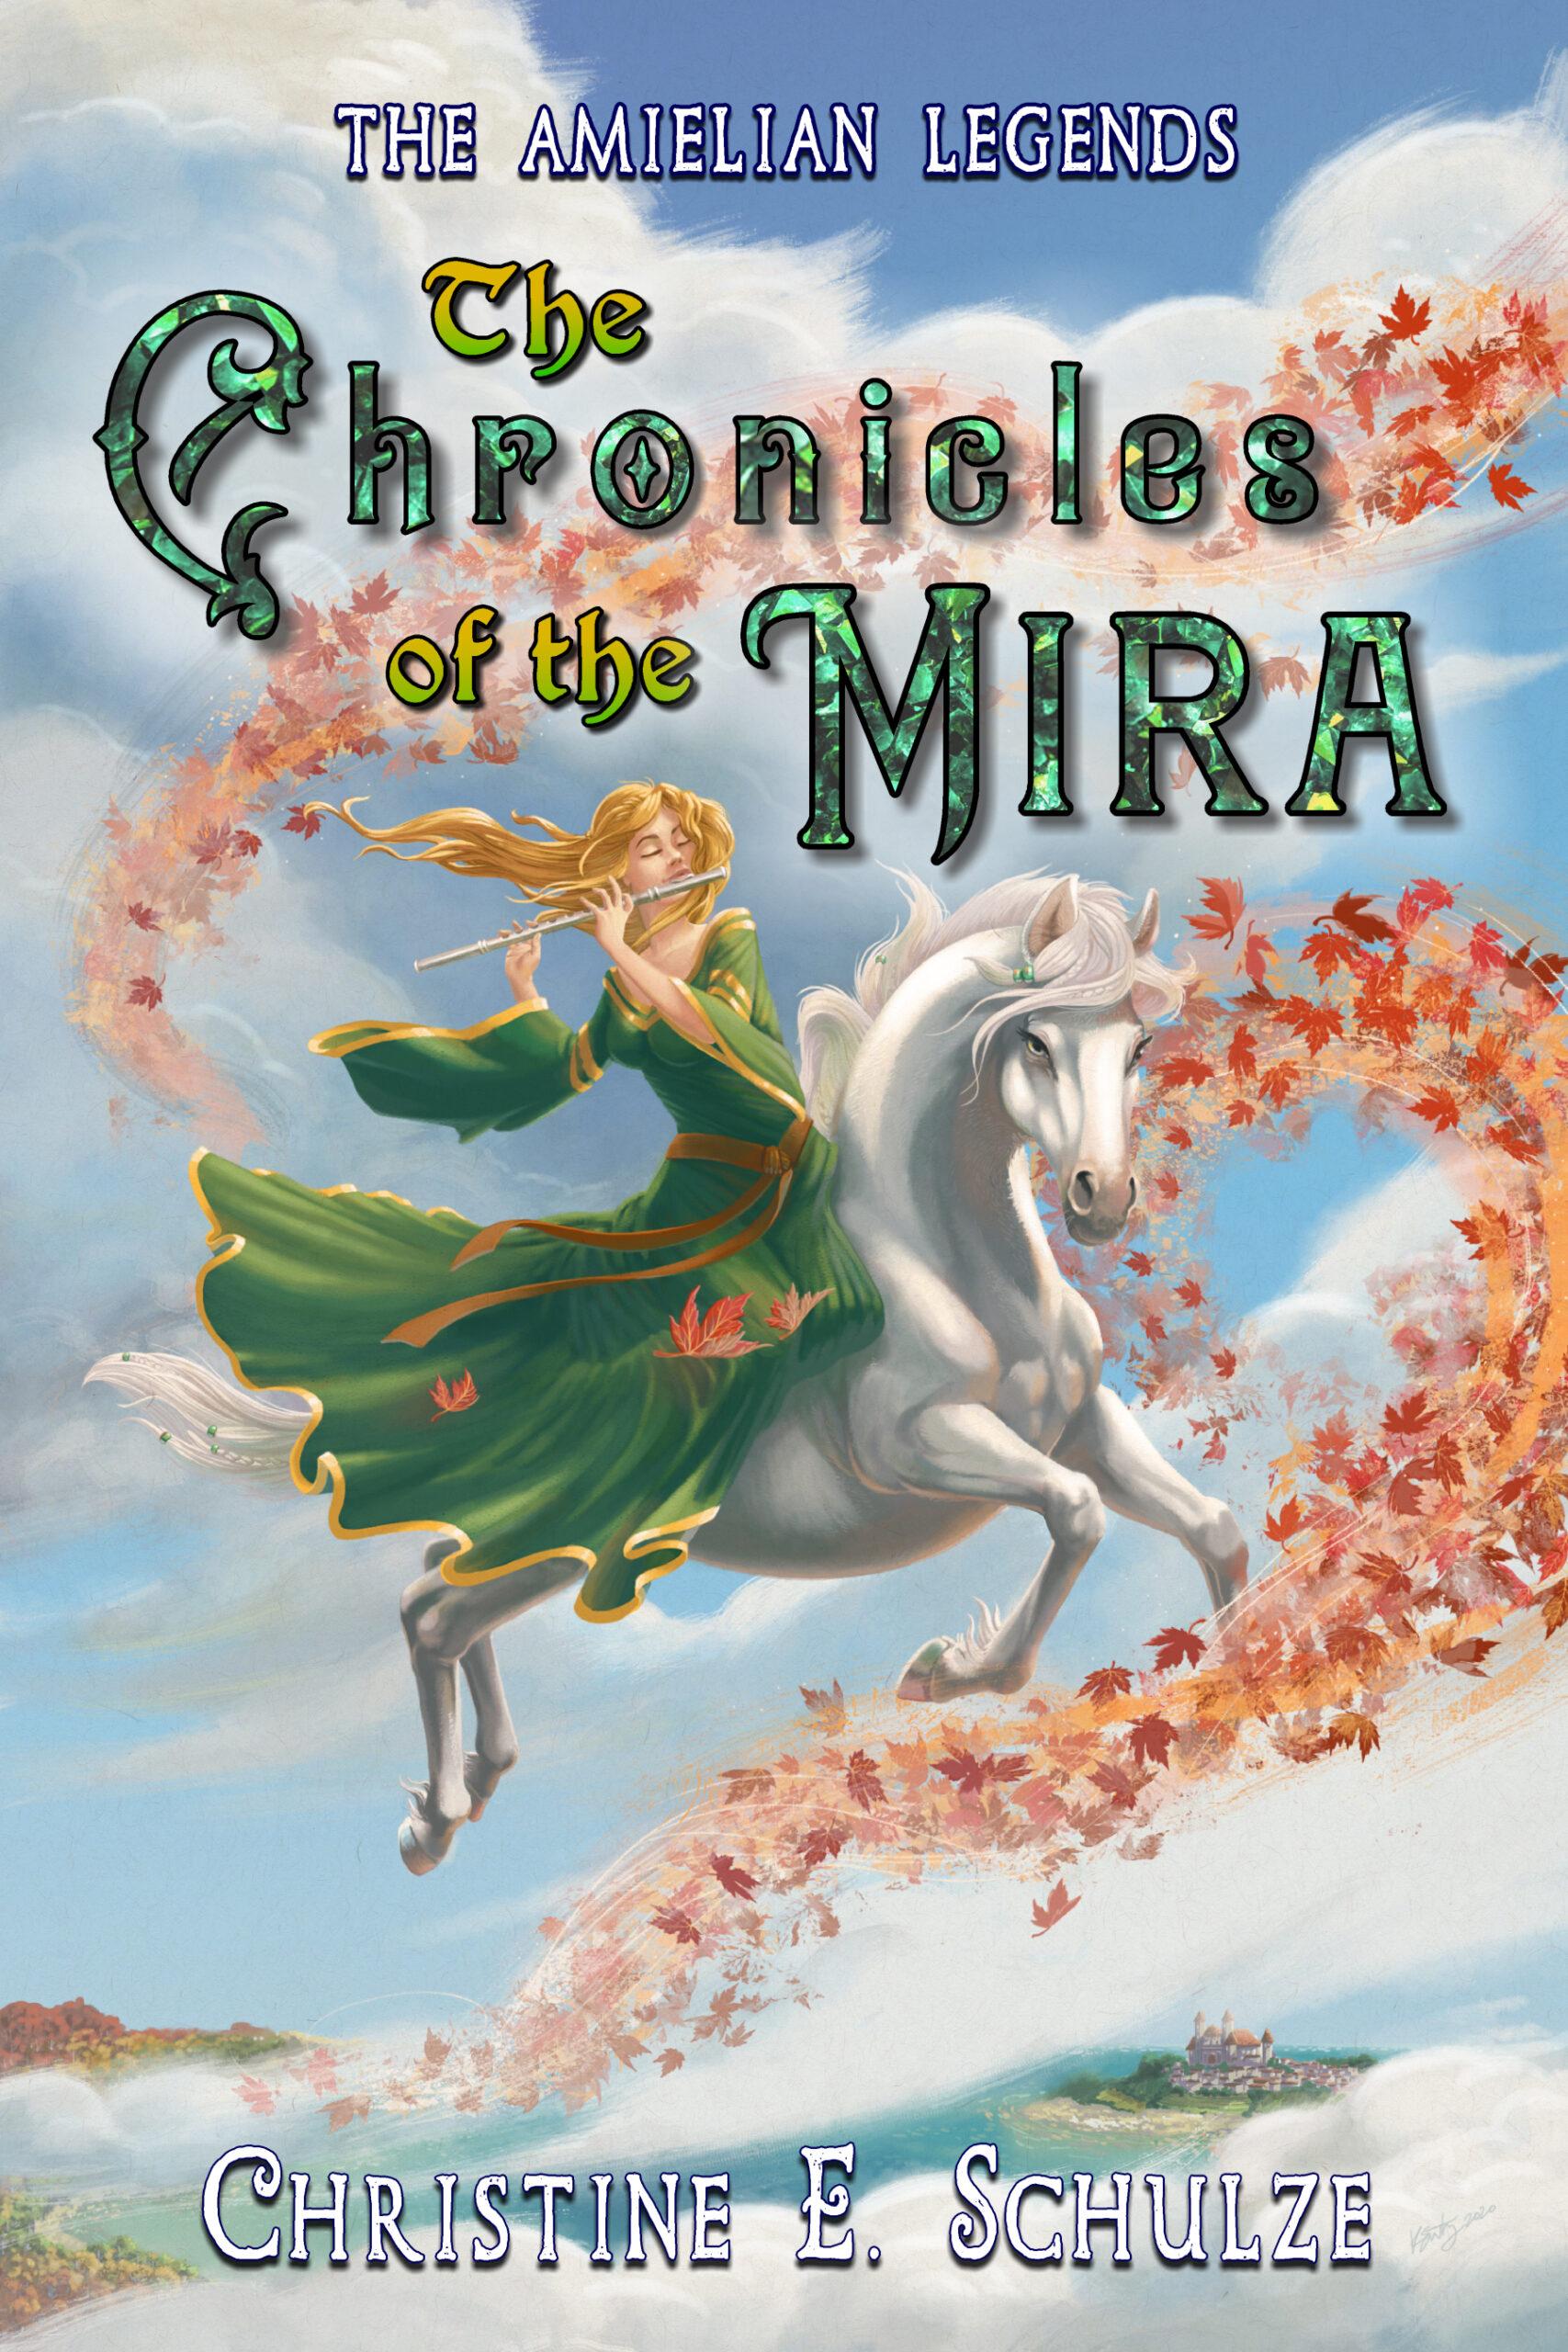 Christine-E.-Schulze_TAL_The-Chronicles-of-the-Mira_6-28-20.jpg